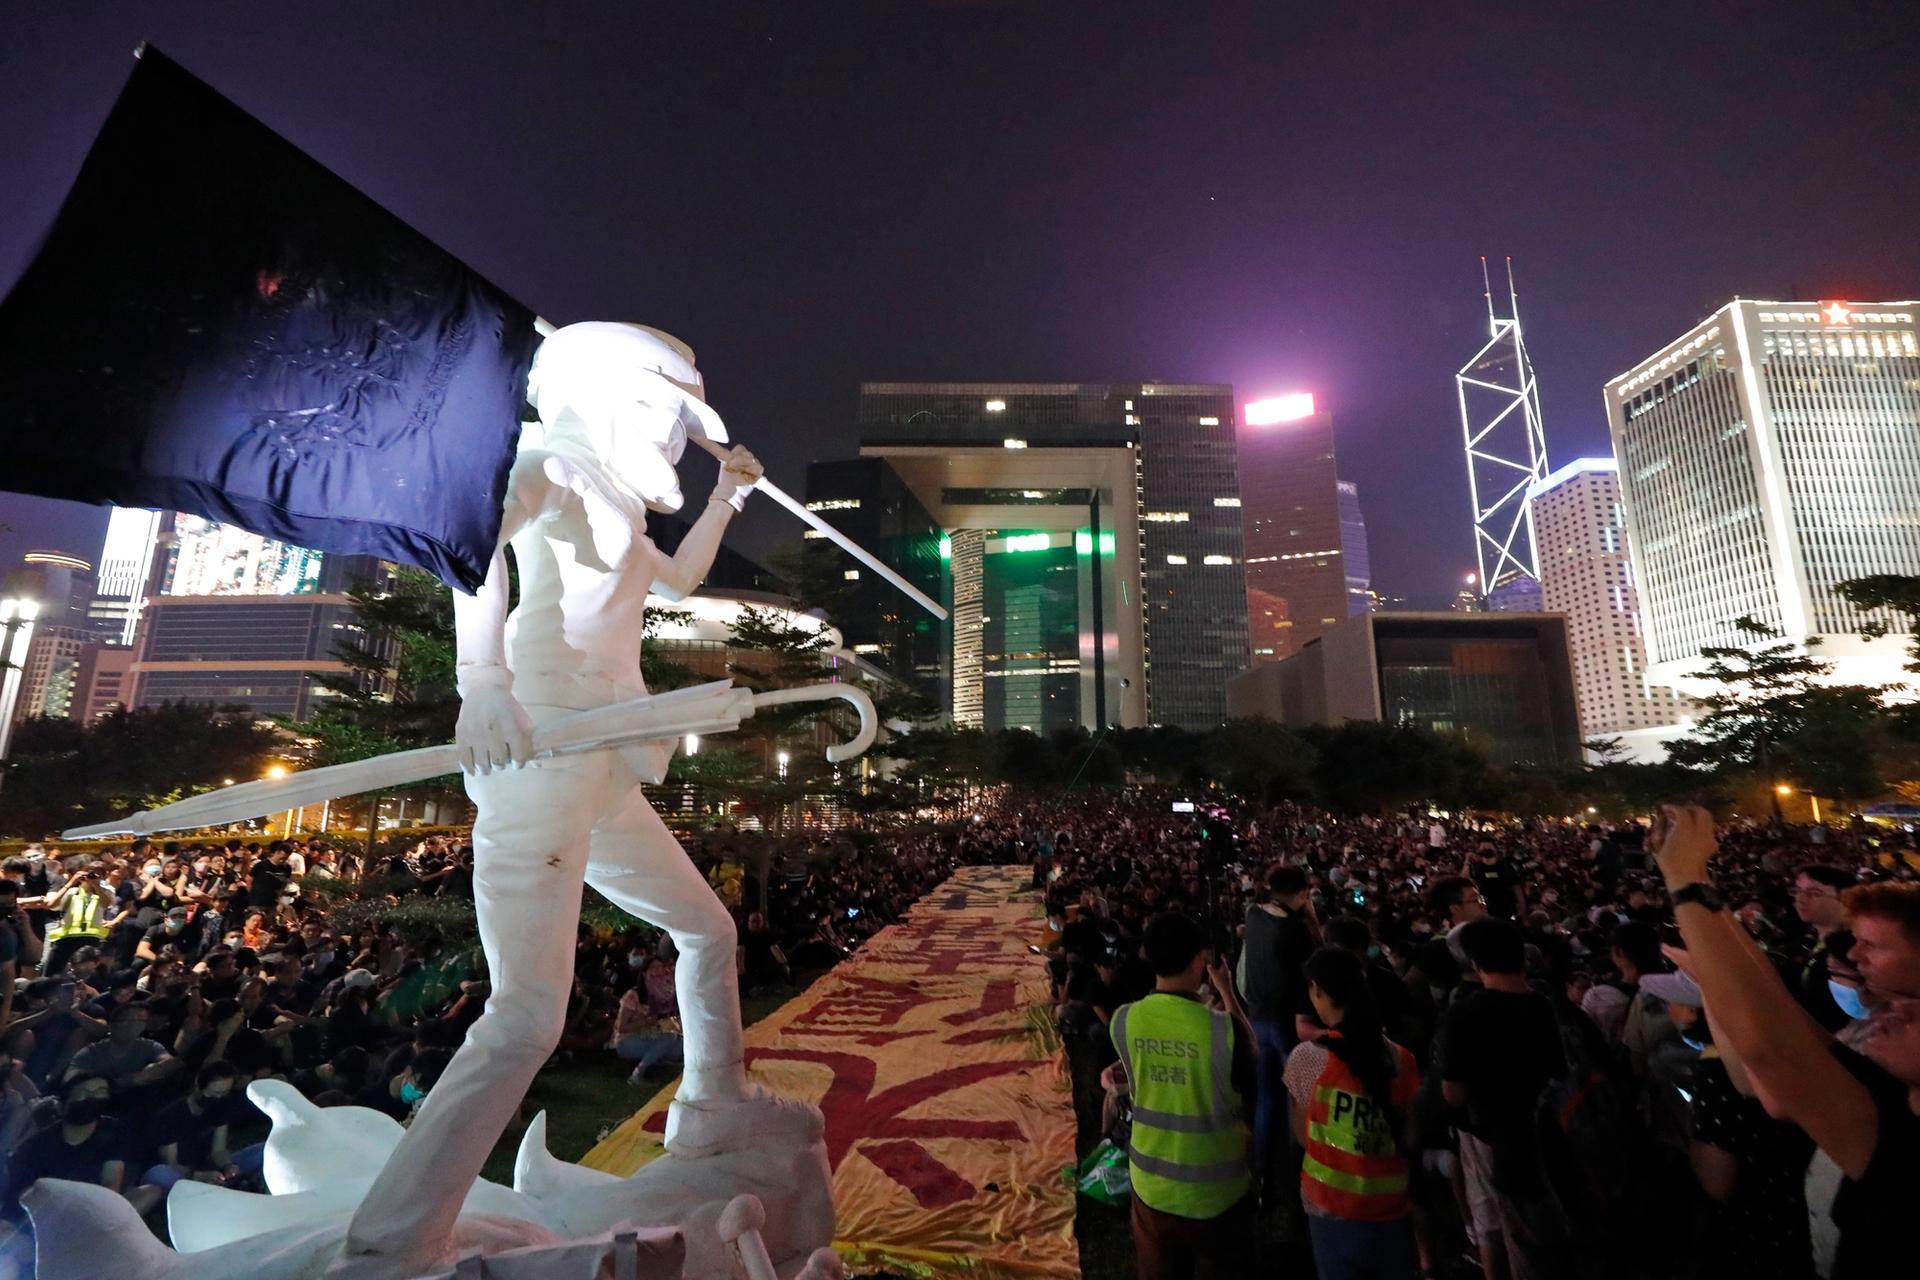 Protestors gather near the Lady Liberty statue, depicting a protestor, at Tamar Park in Hong Kong, Saturday, 28 September 2019 AP Photo/Vincent Thian